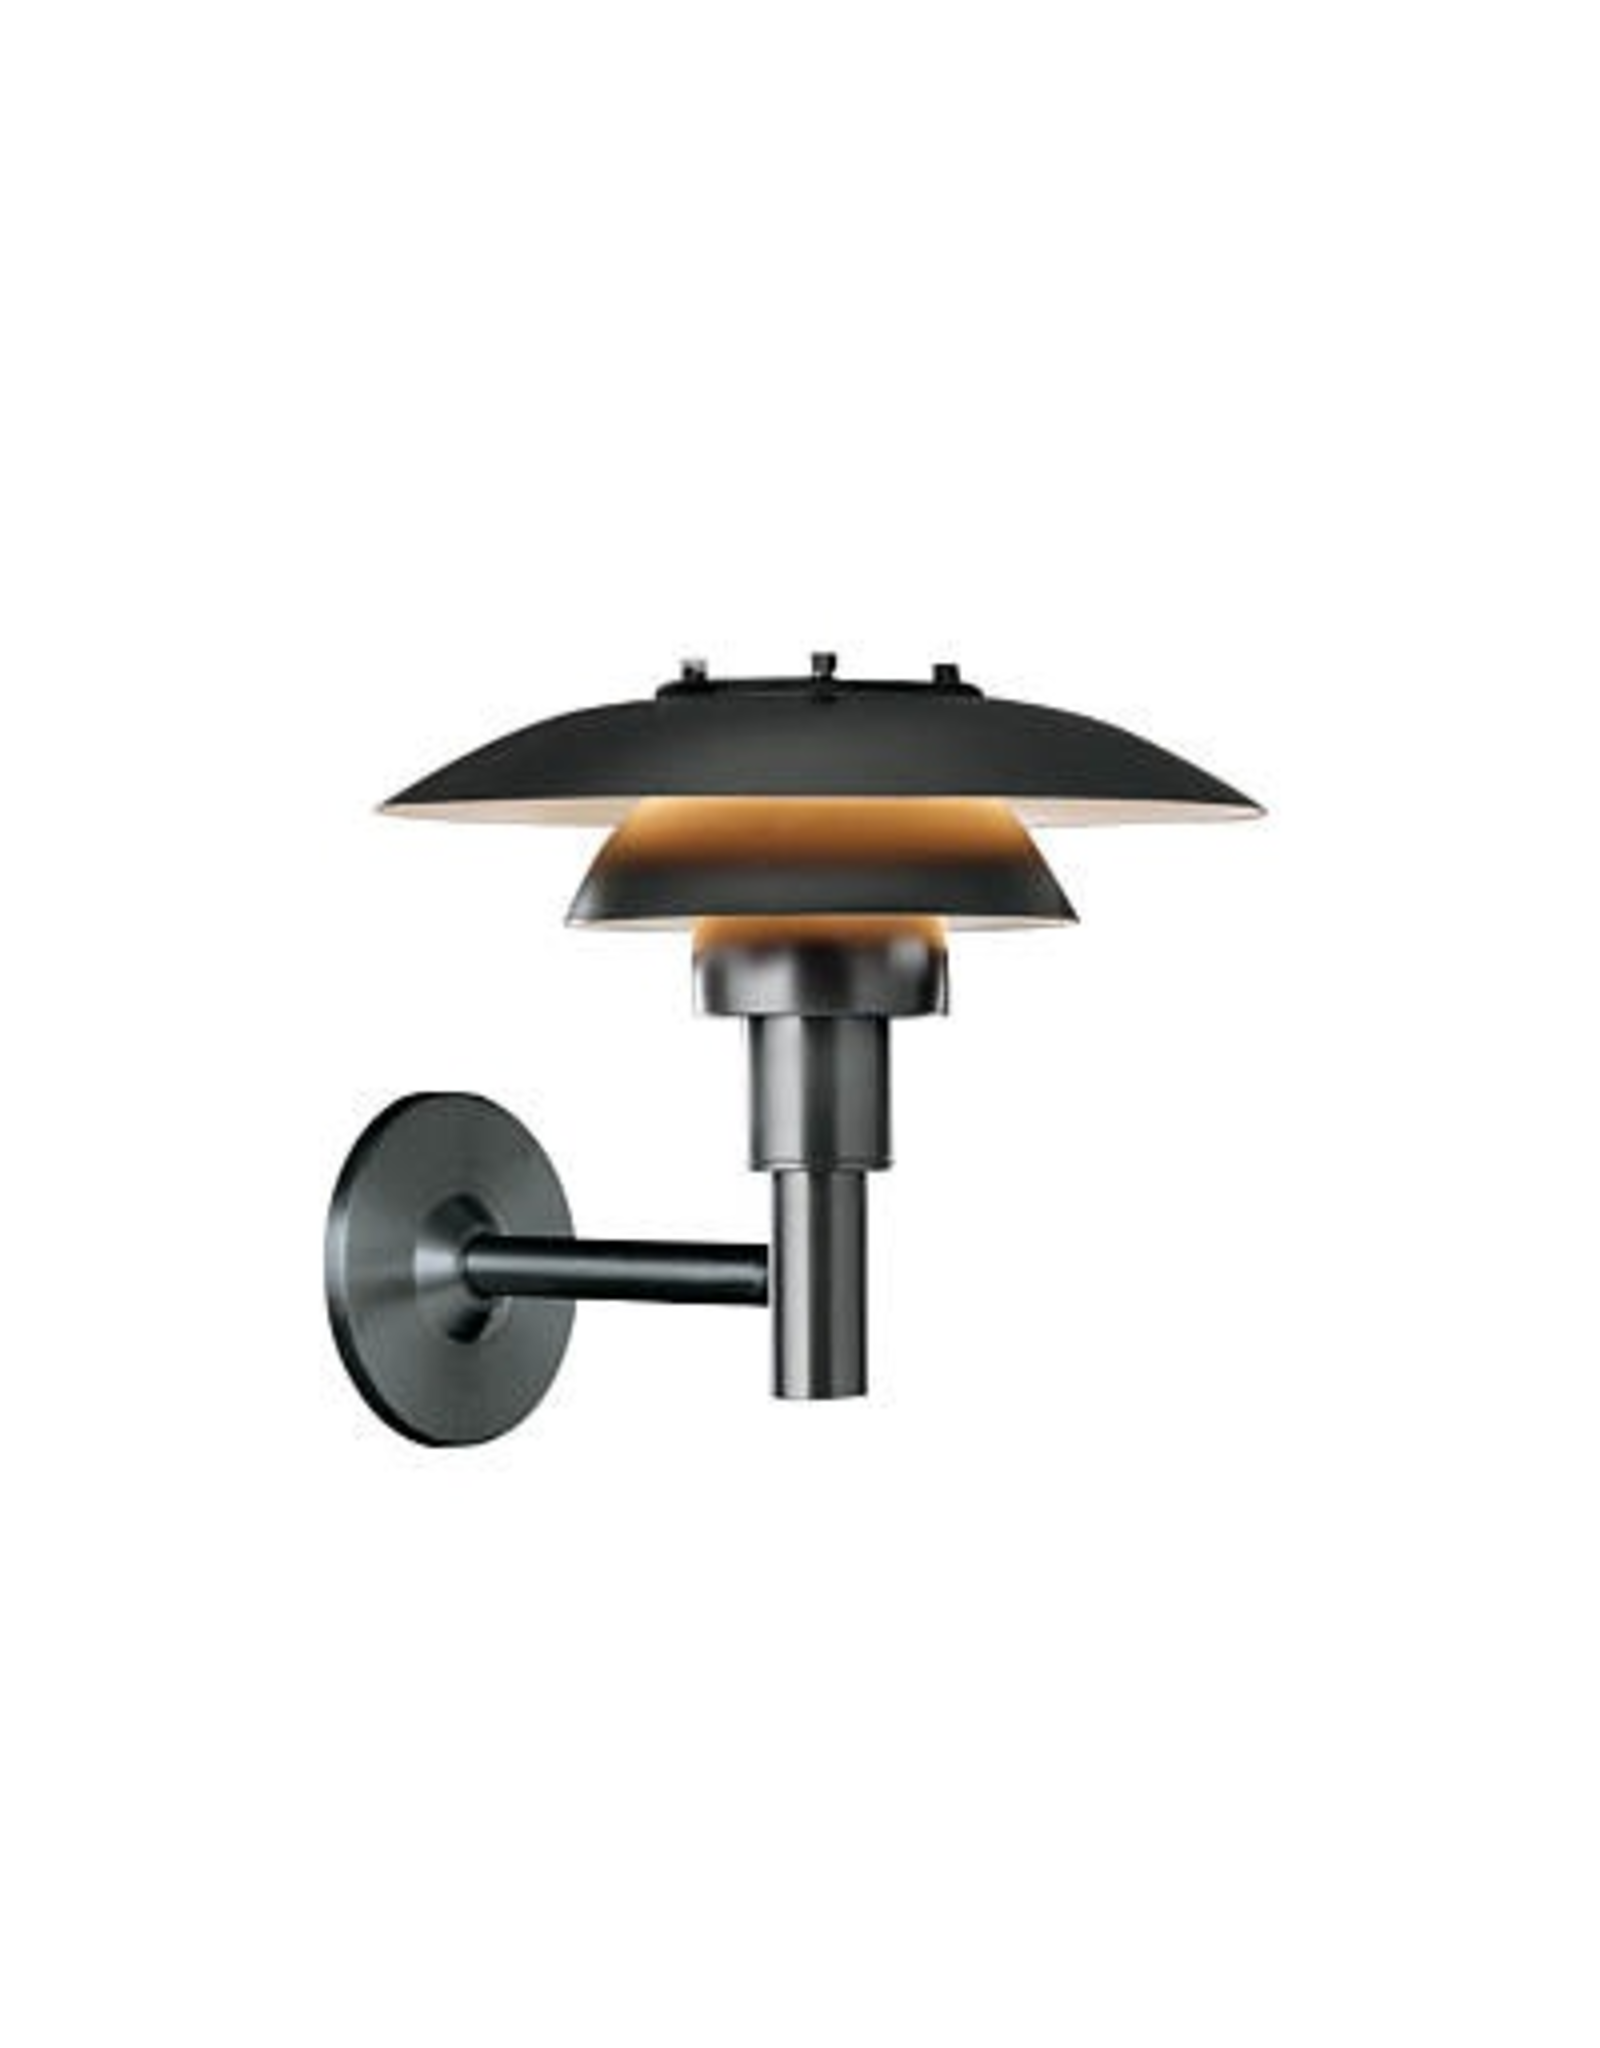 PH 3-2 1/2 OUTDOOR WALL LAMP, BLACK POWDER COATED